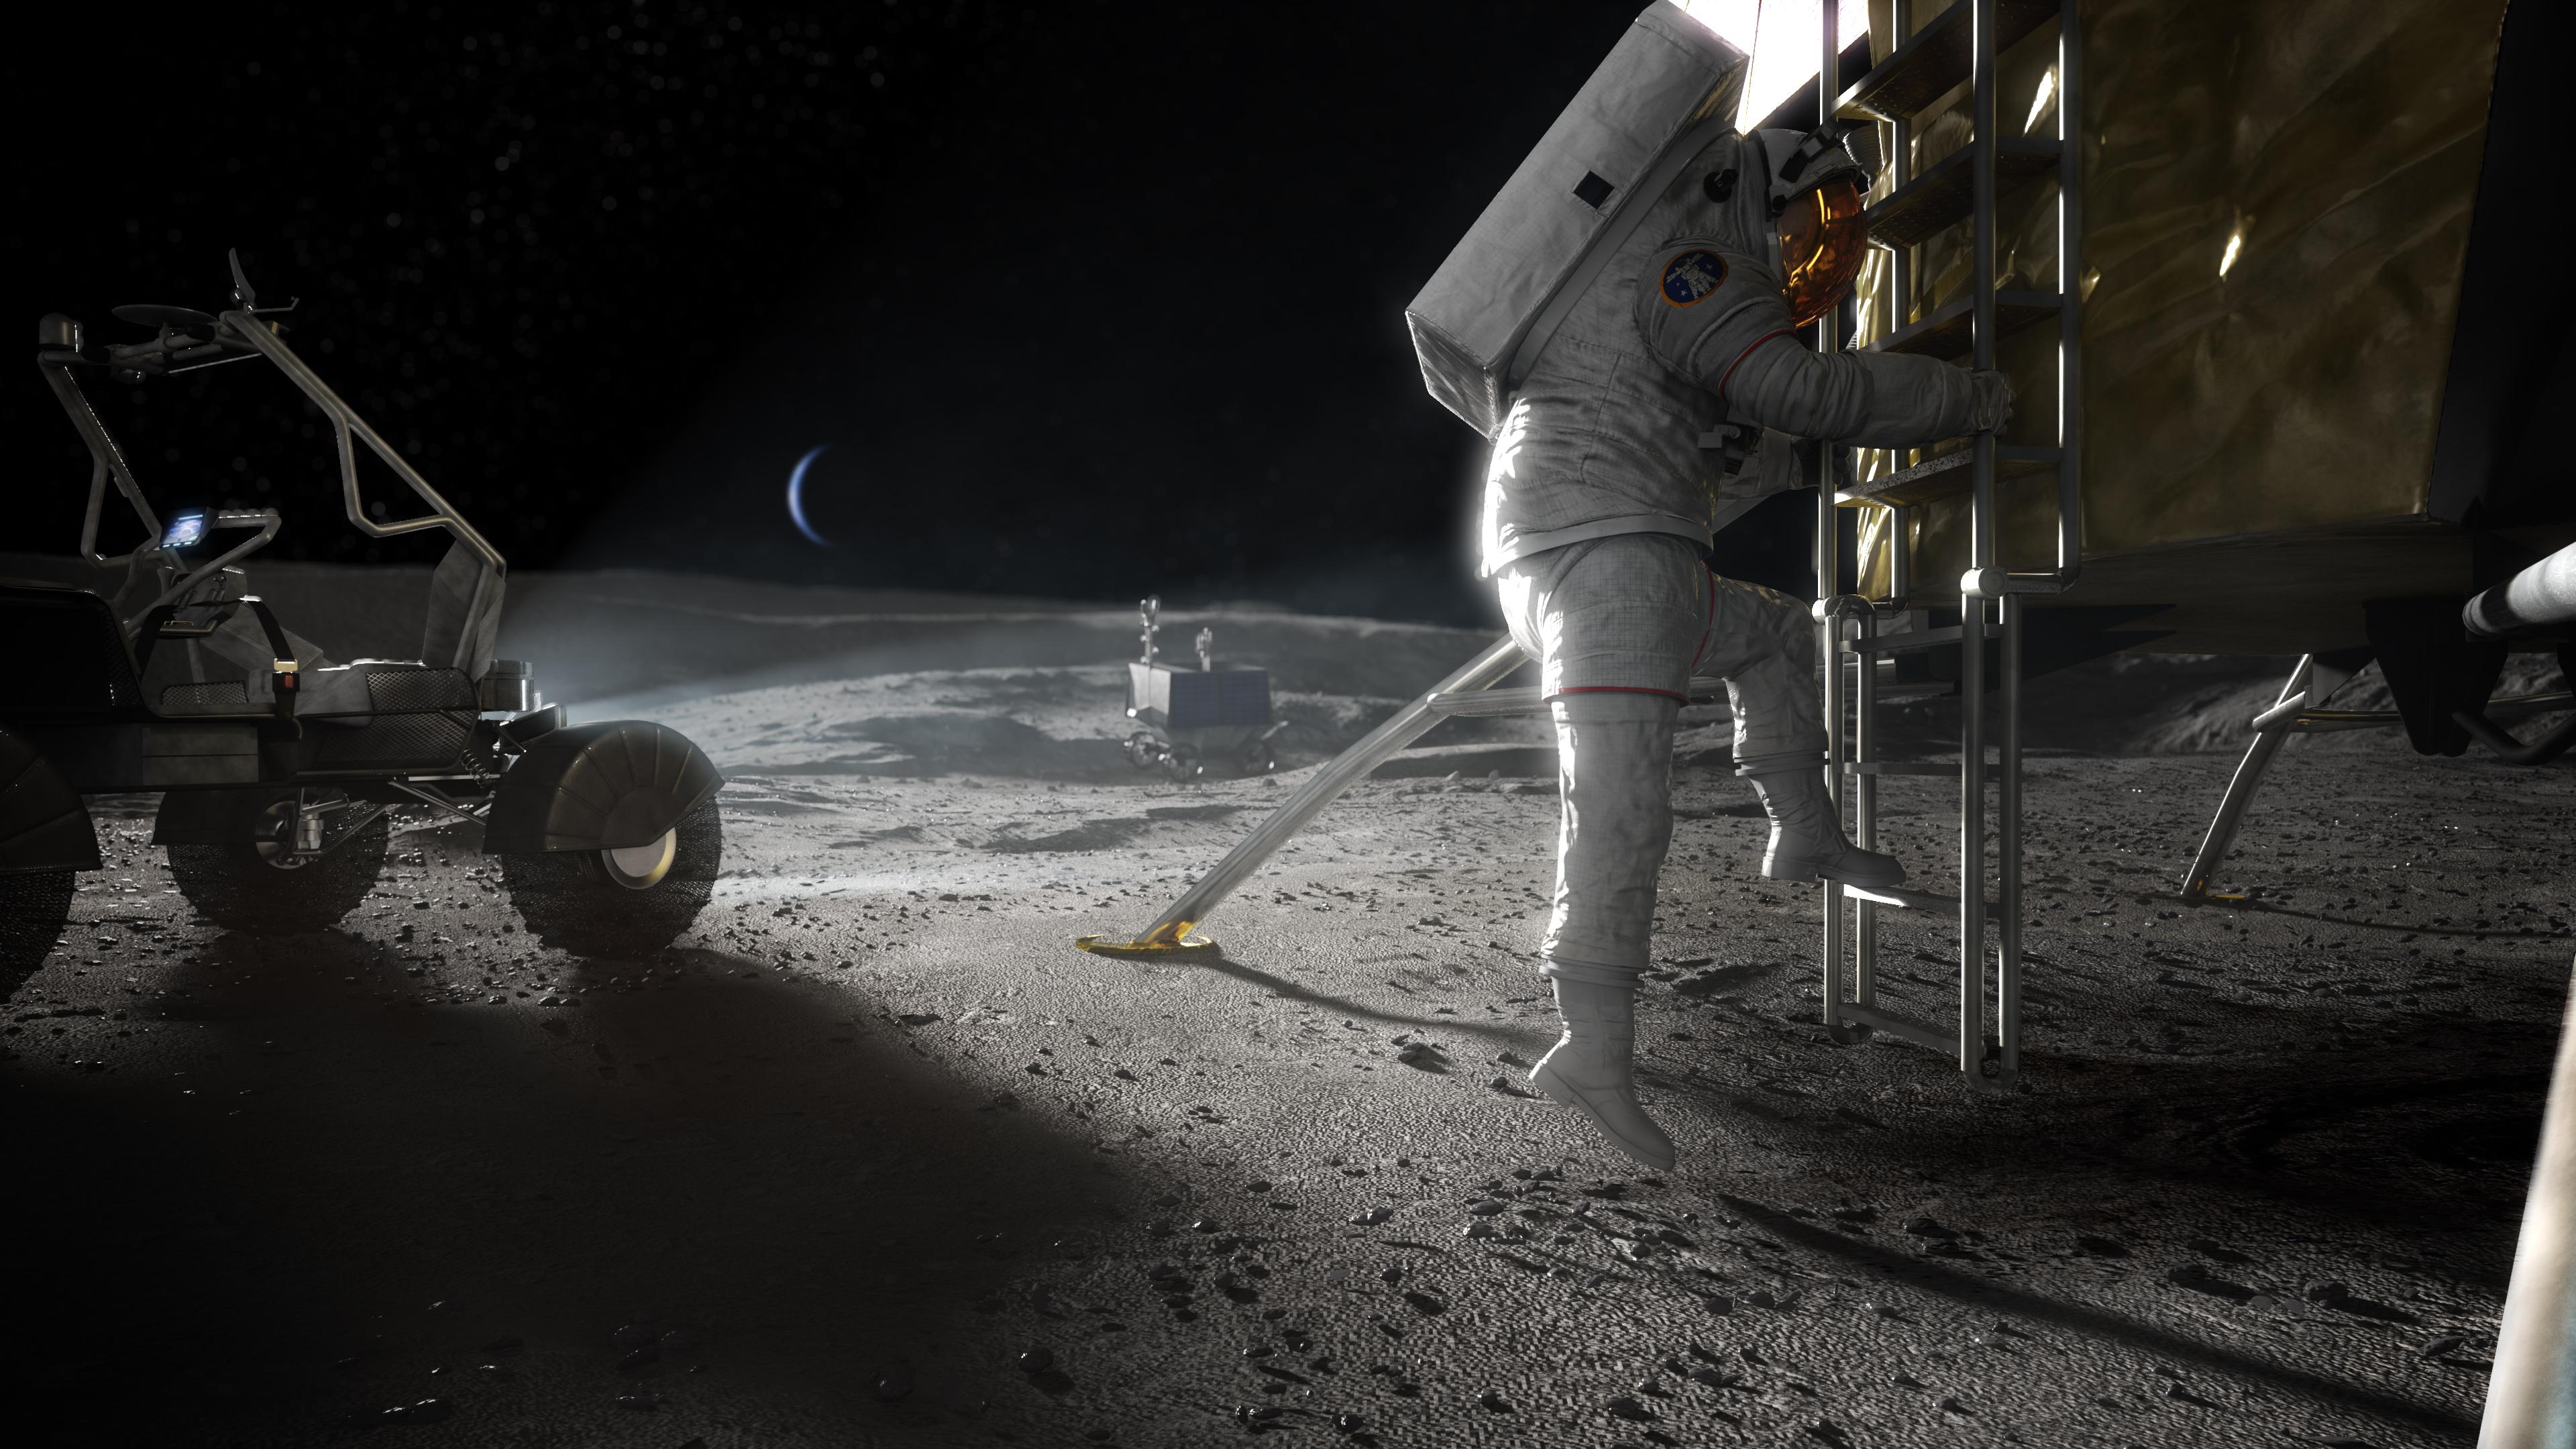 lunar capabilities.'